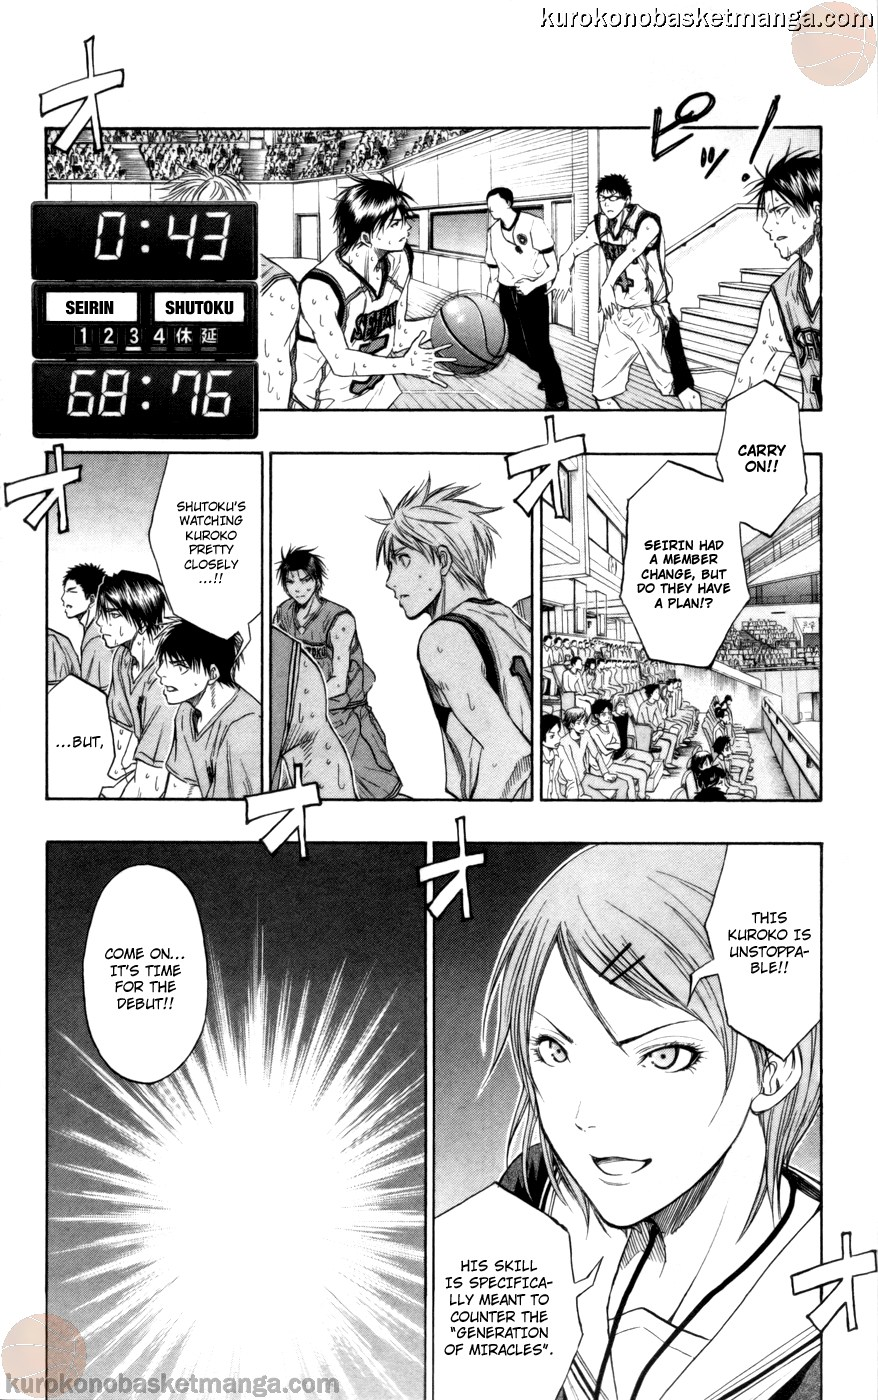 Kuroko no Basket Manga Chapter 90 - Image 07